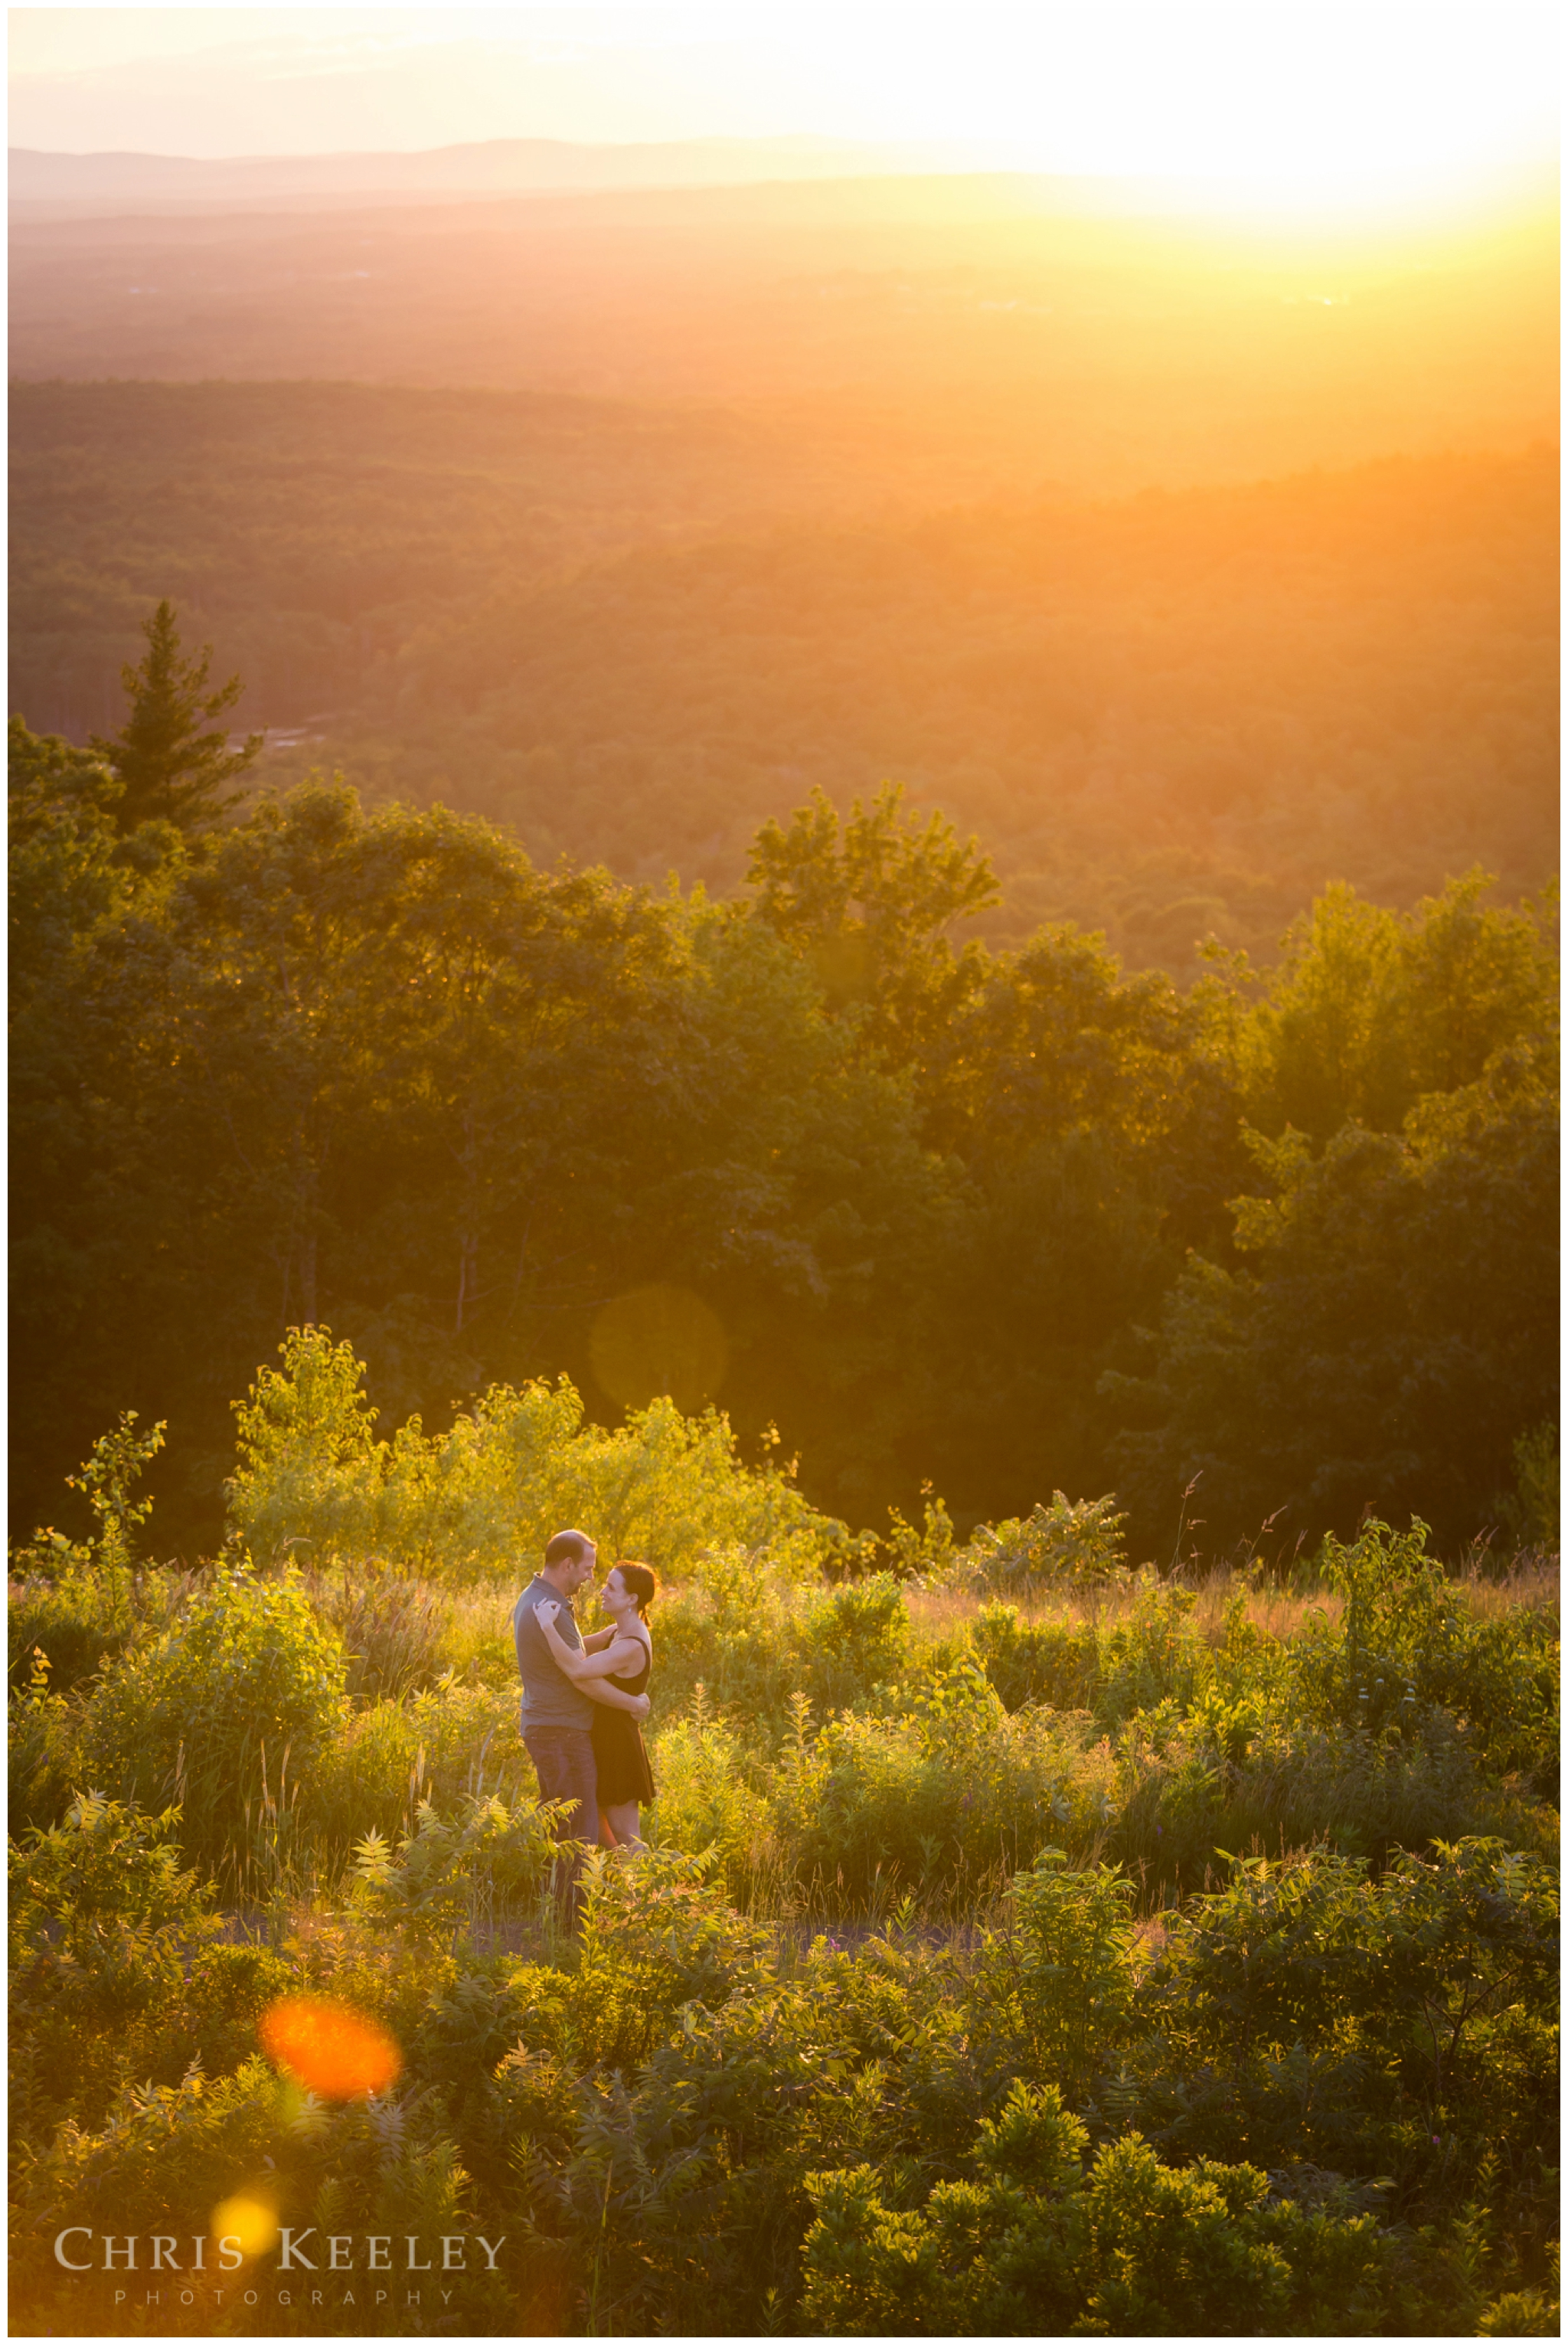 wedding-photographer-dover-new-hampshire-chris-keeley-photography-02.jpg